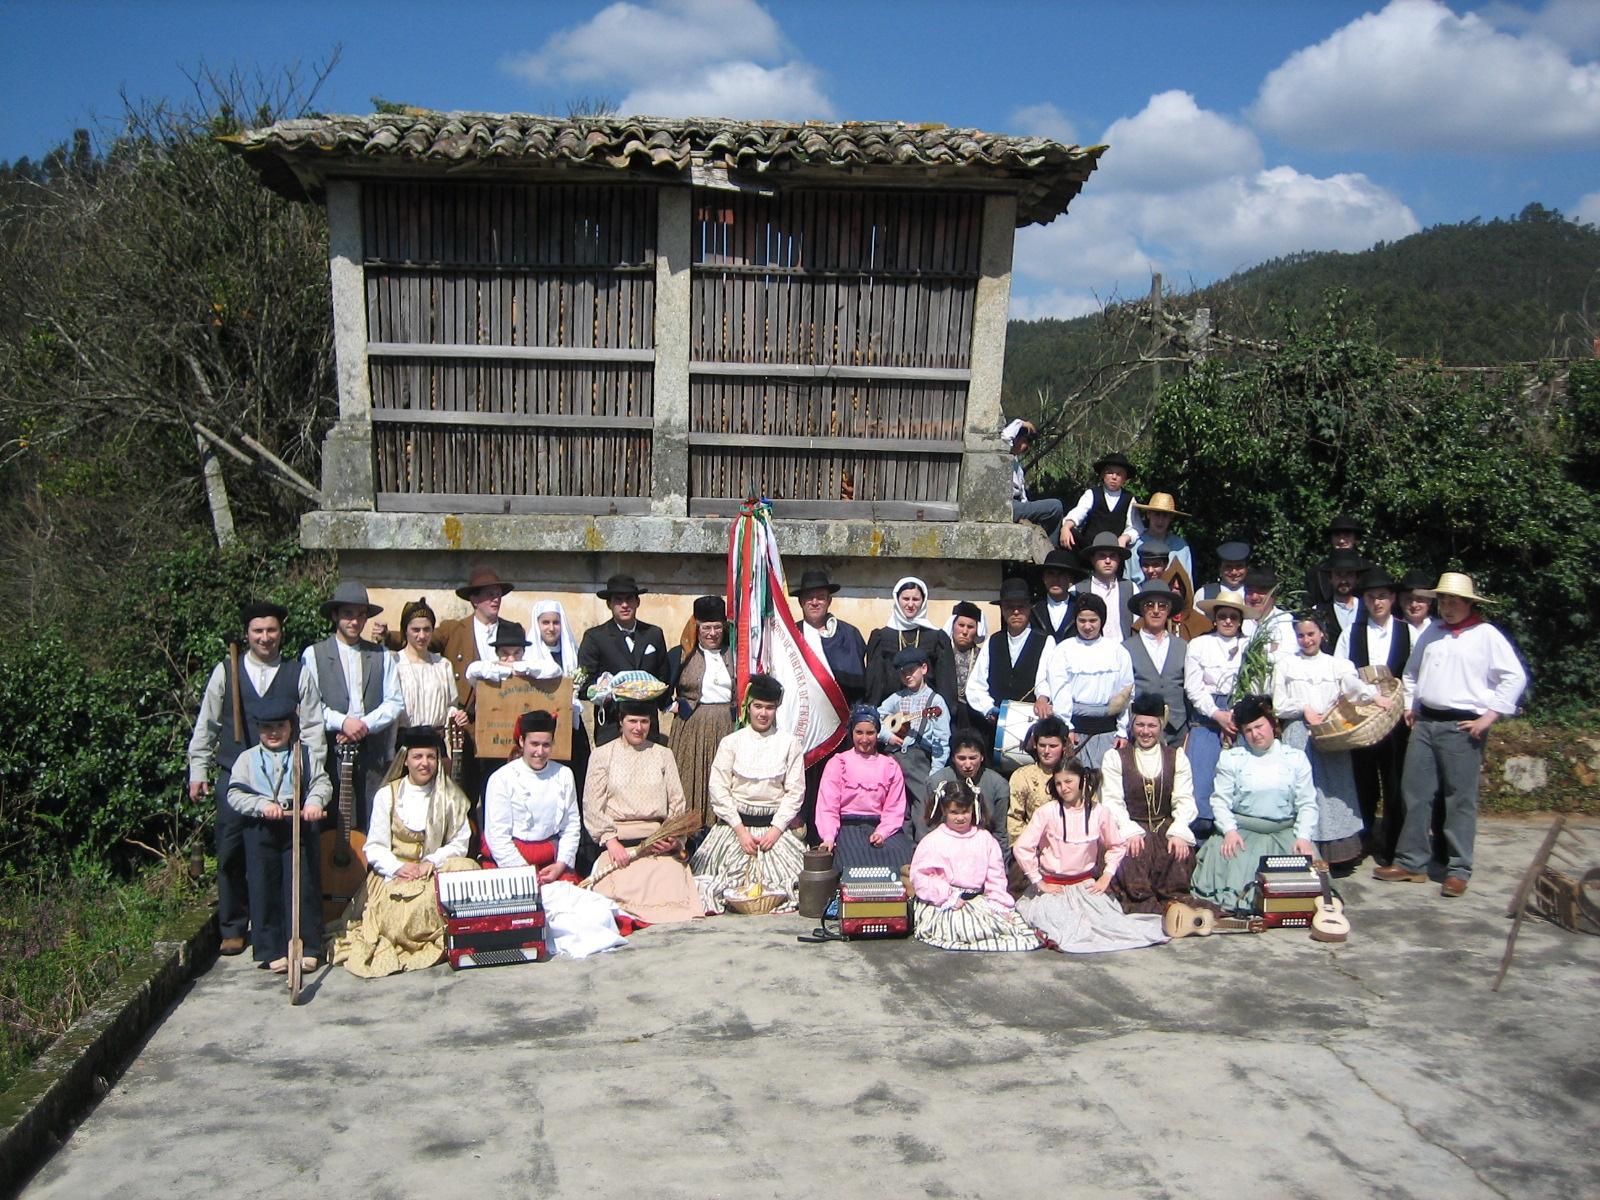 Rancho Folclórico da Ribeira de Fráguas